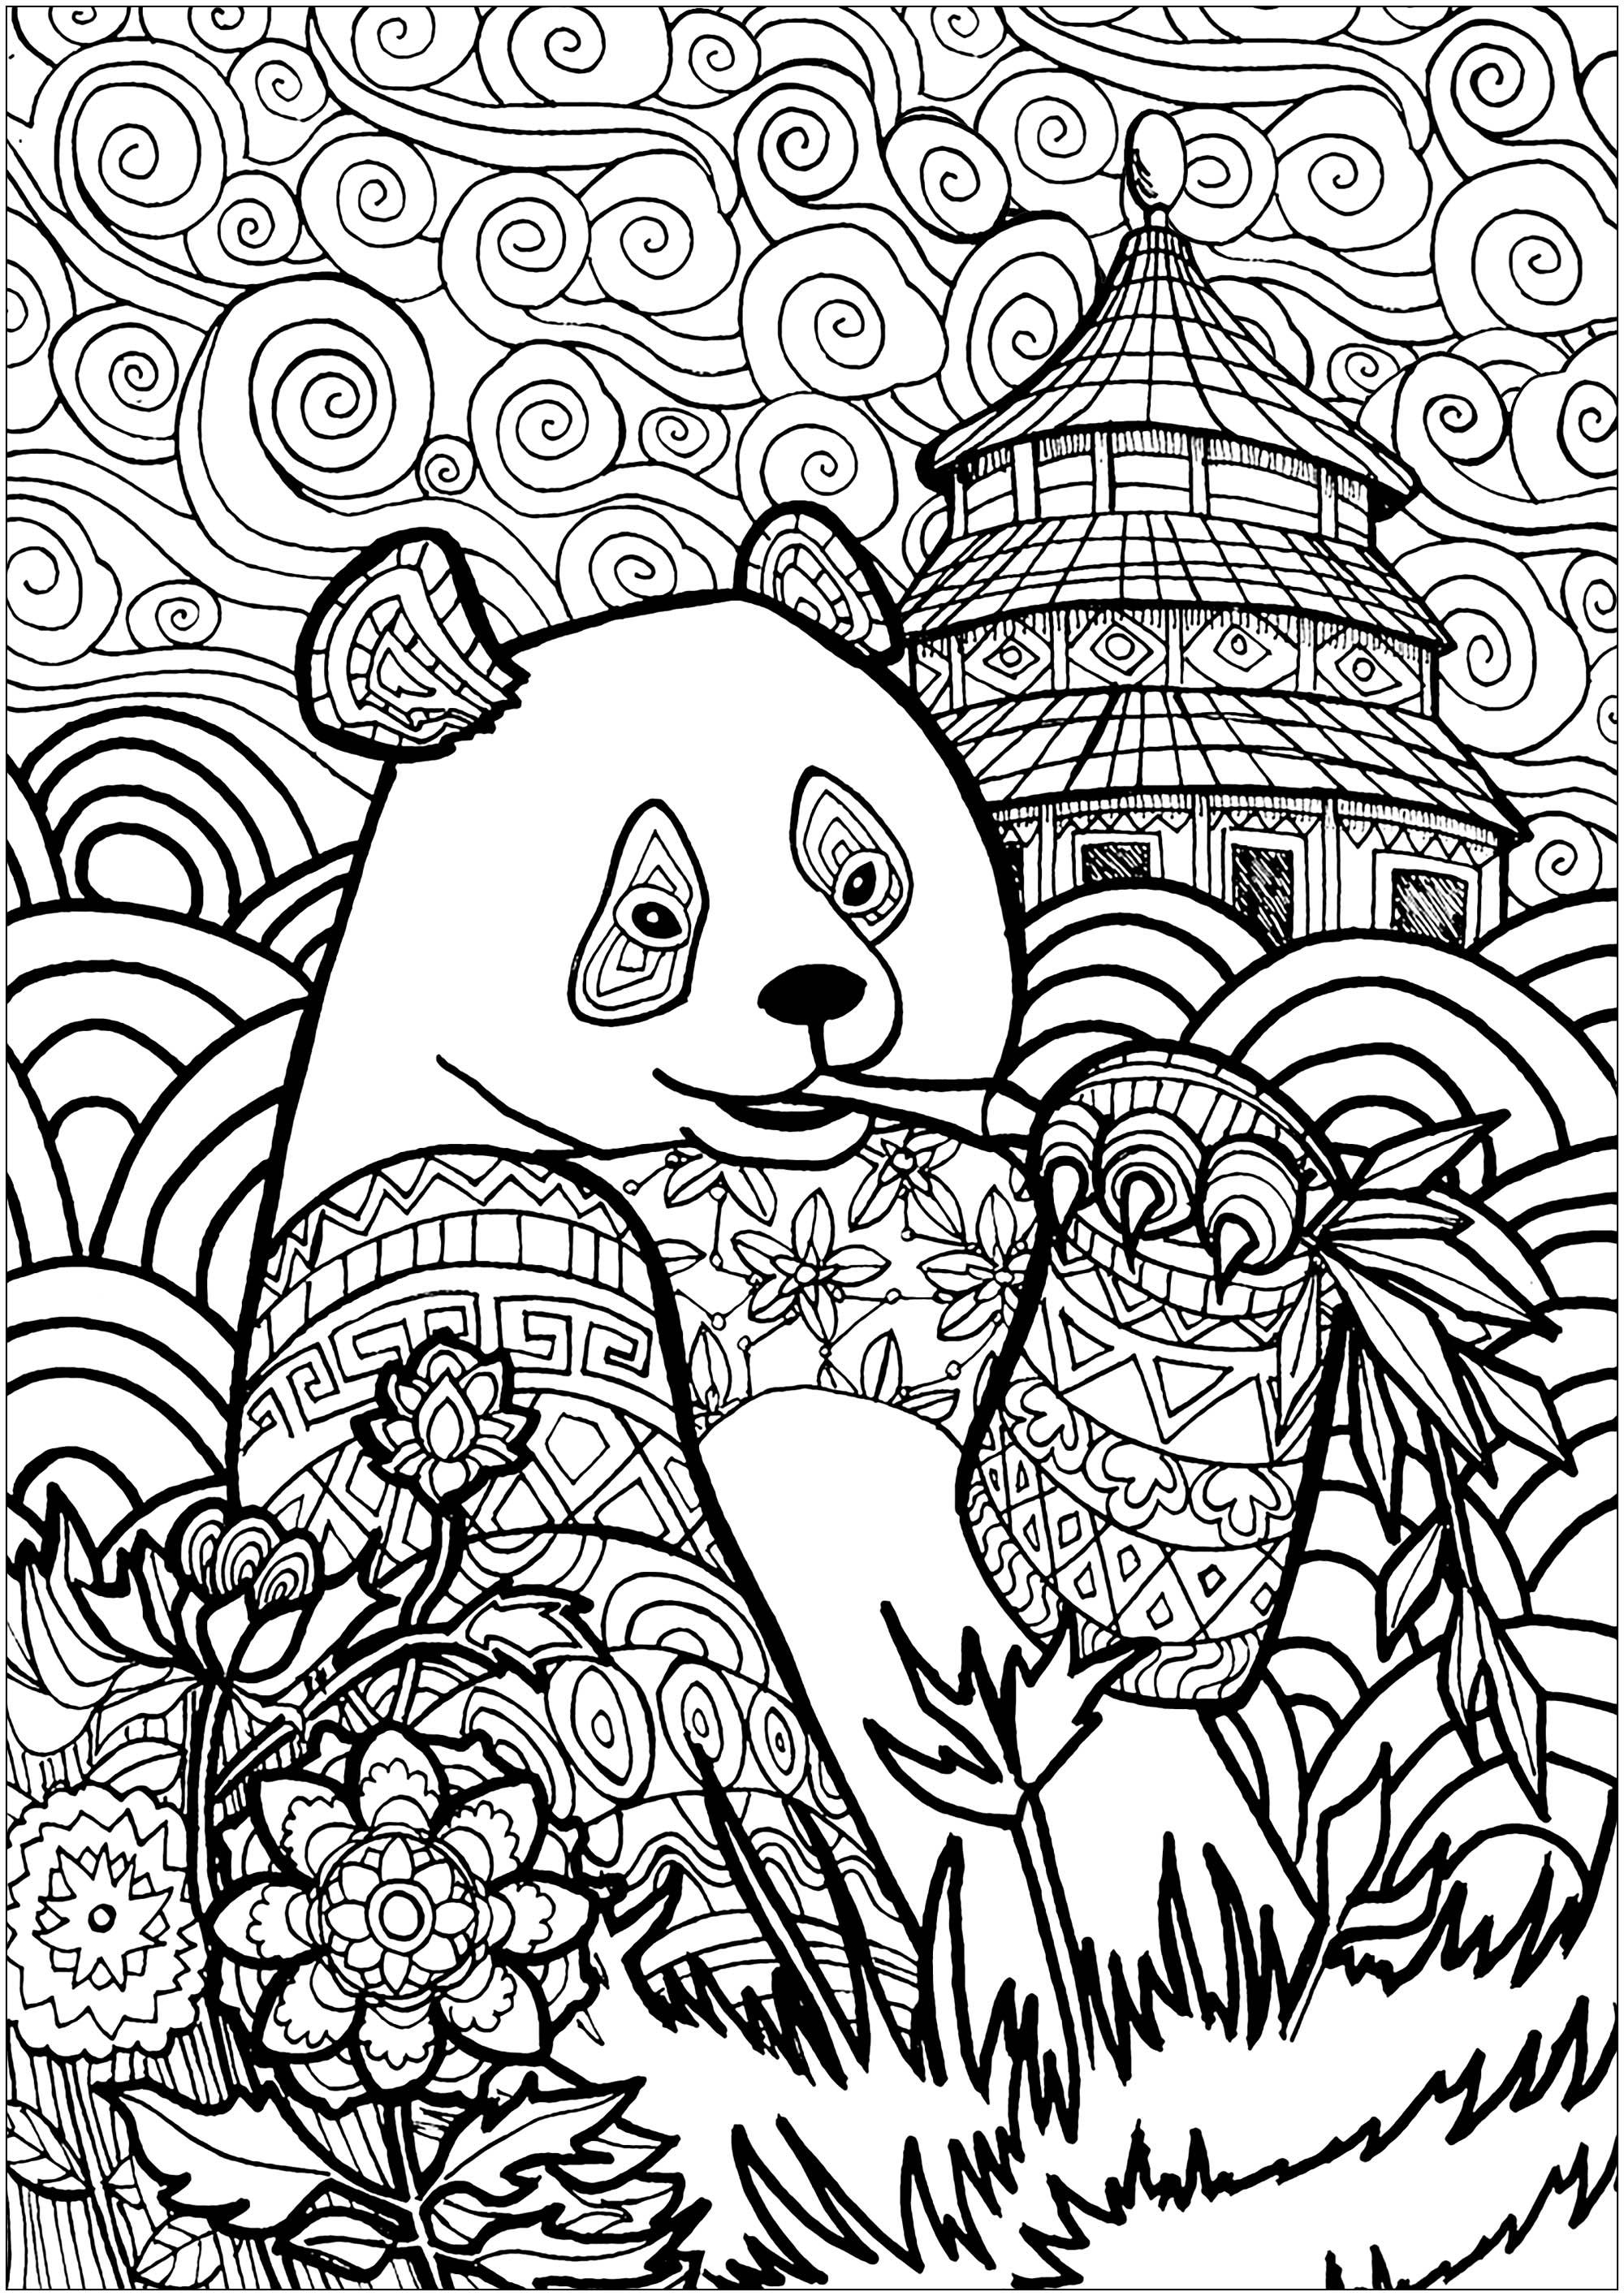 Colorear para Adultos : Panda - 1